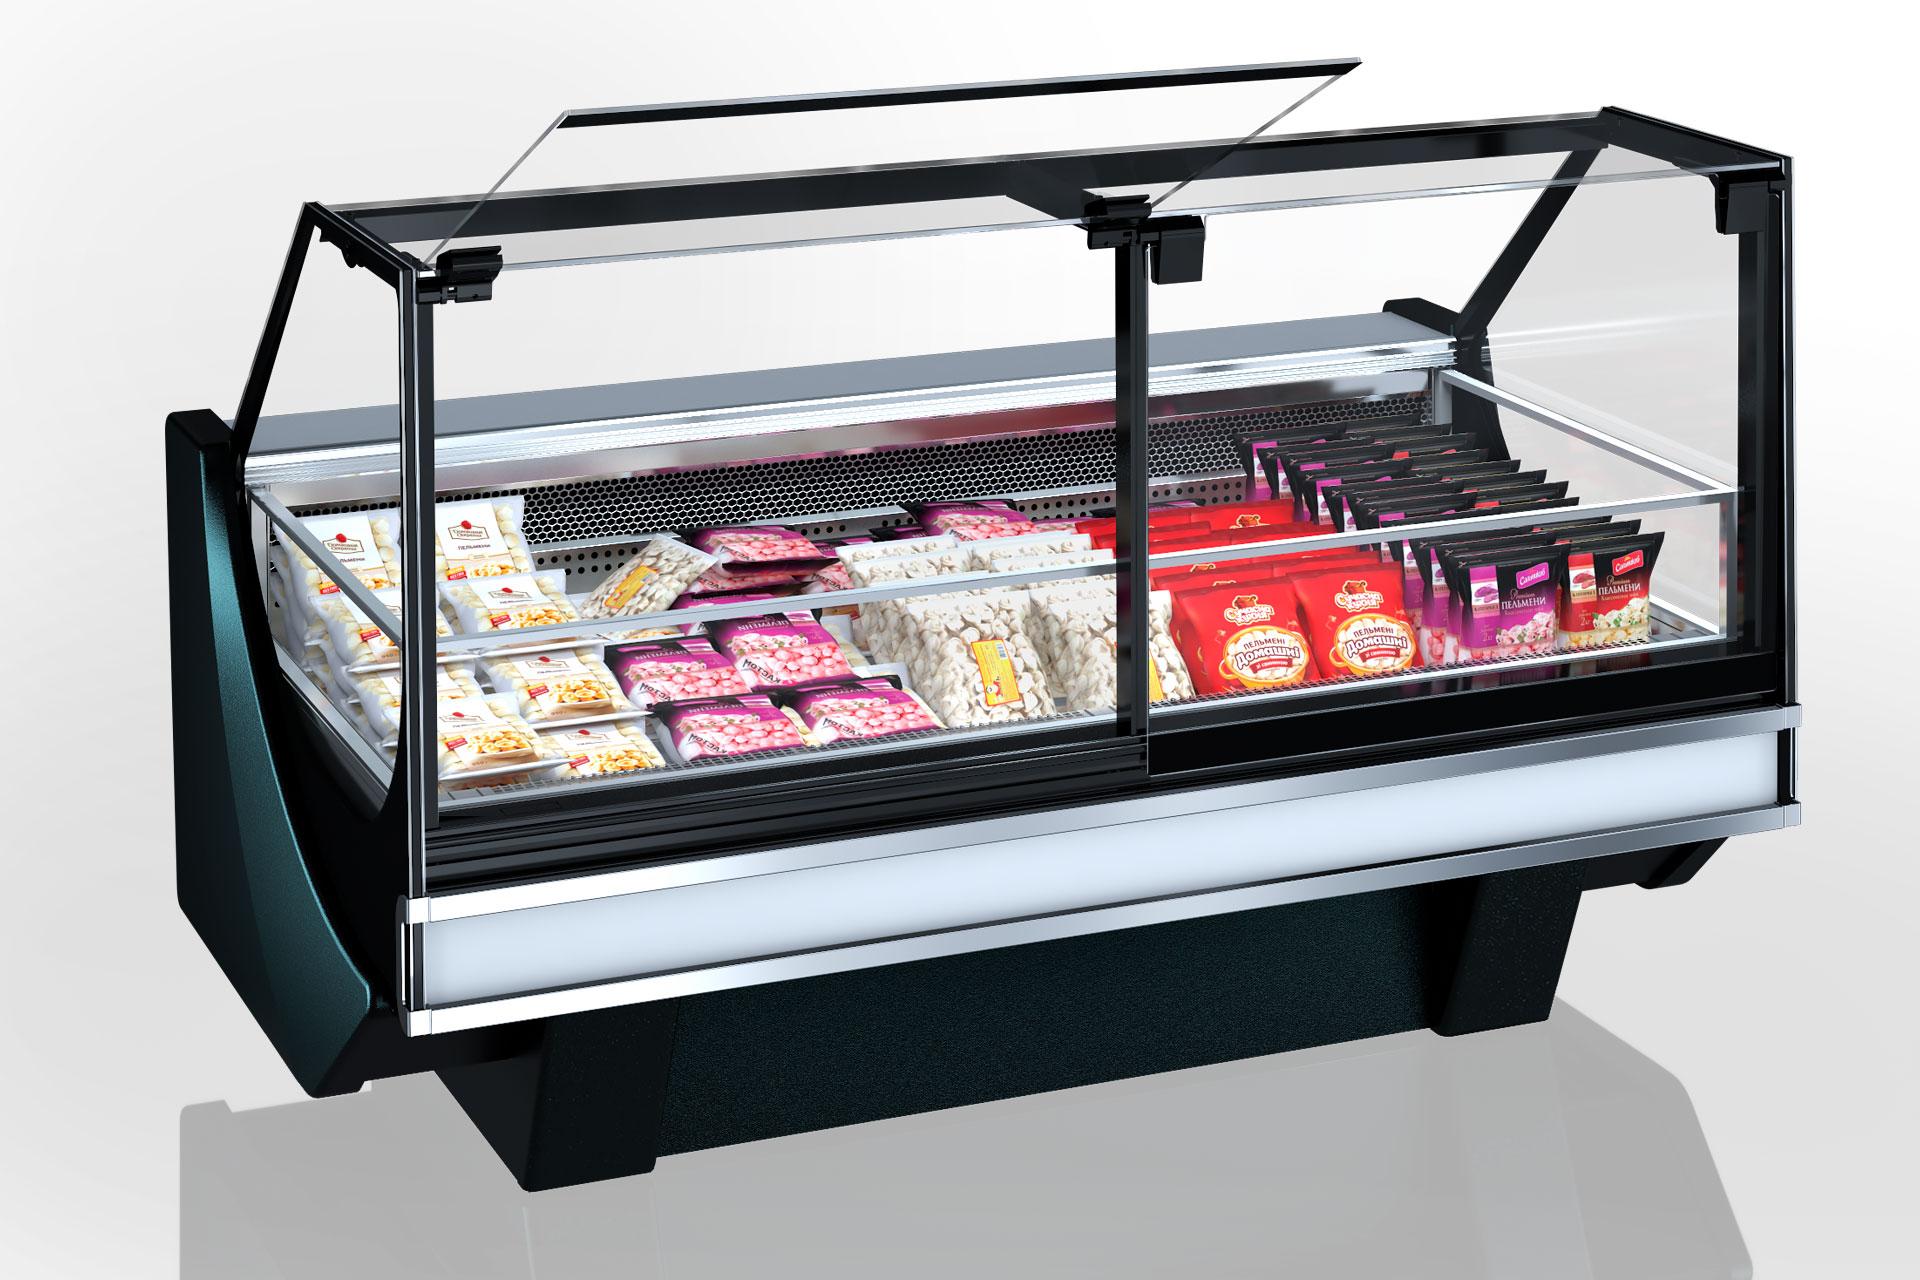 Refrigerated counter missouri cold diamond MC 126 LT PS